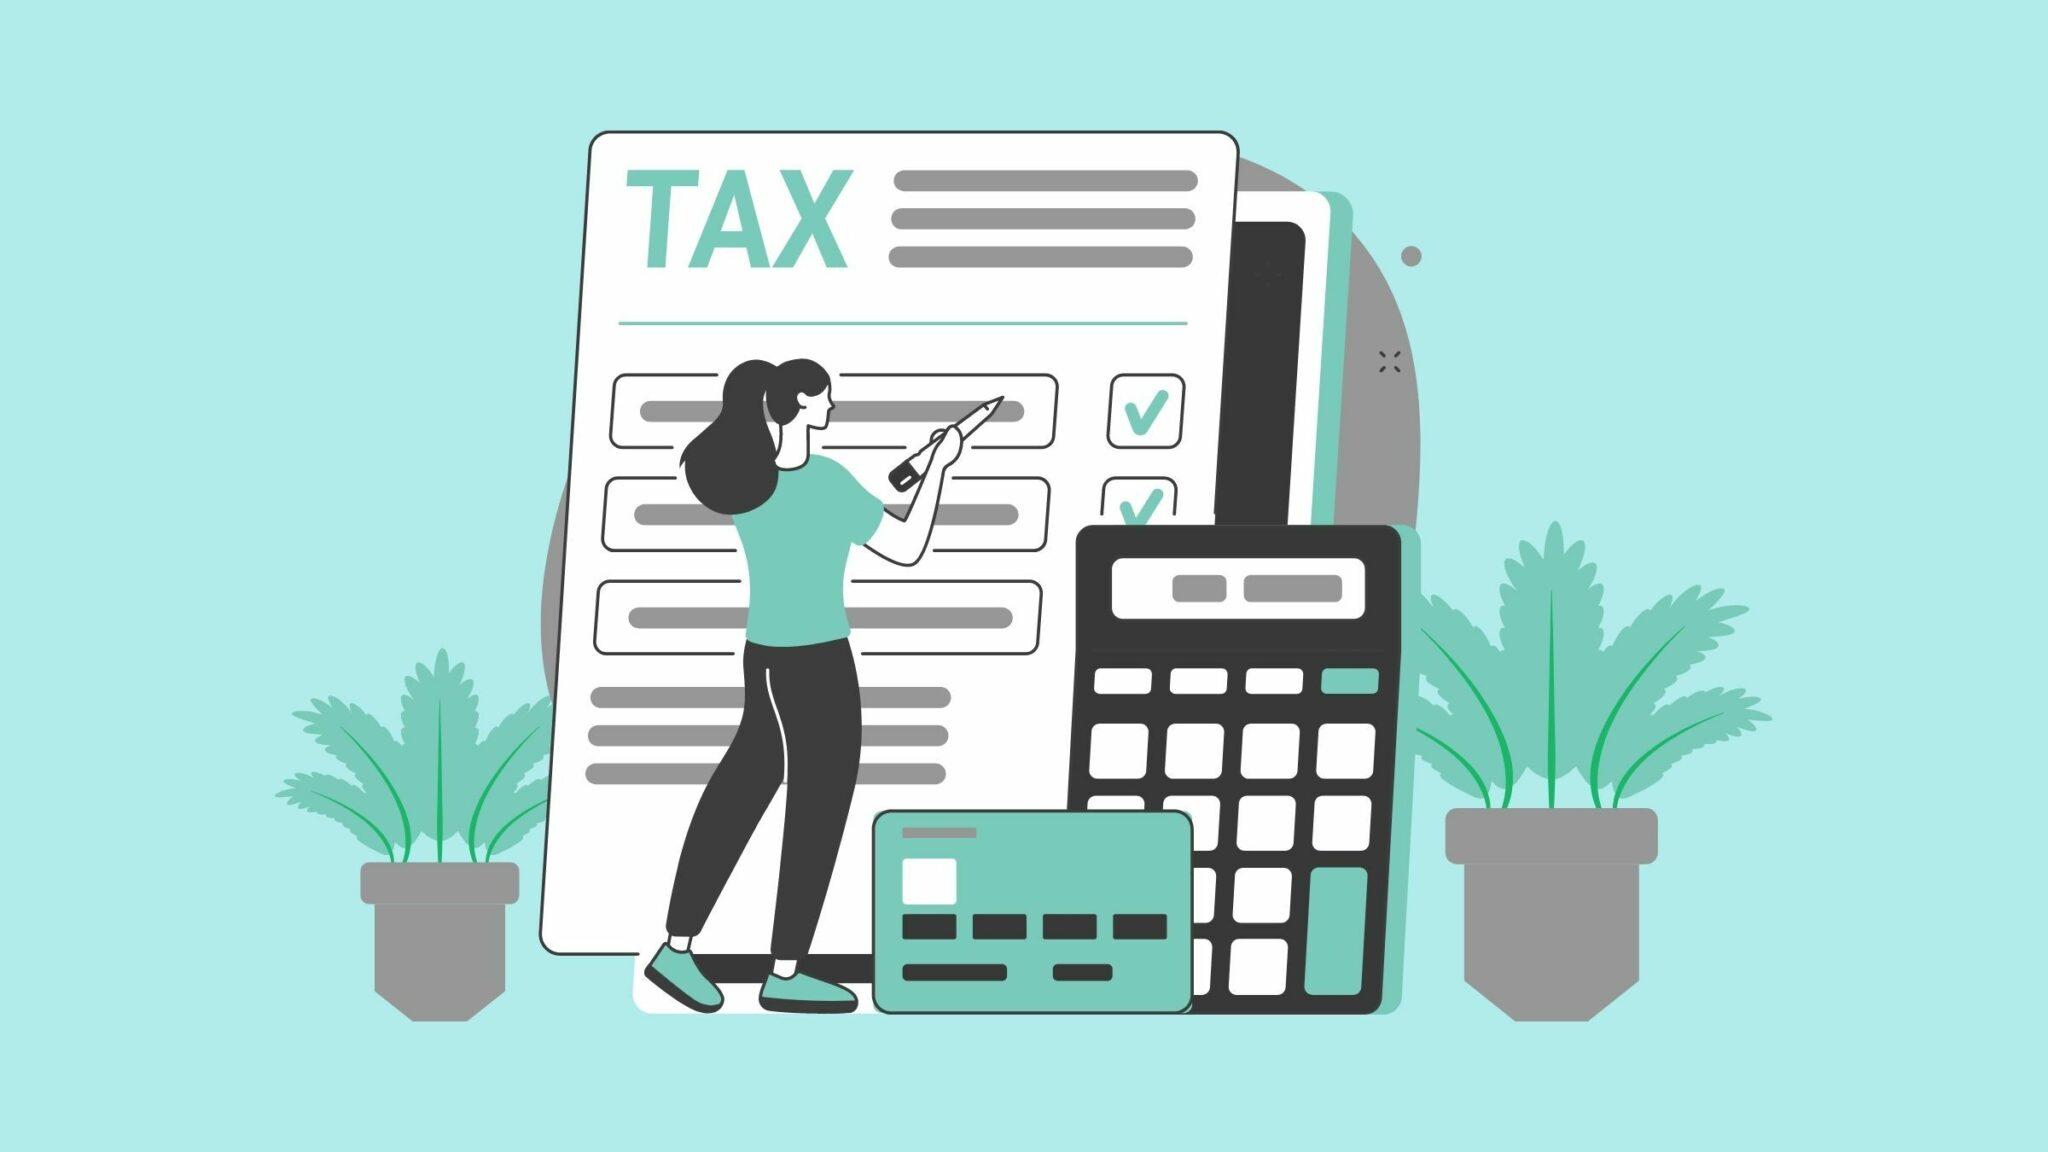 taxation-img-scaled.jpg